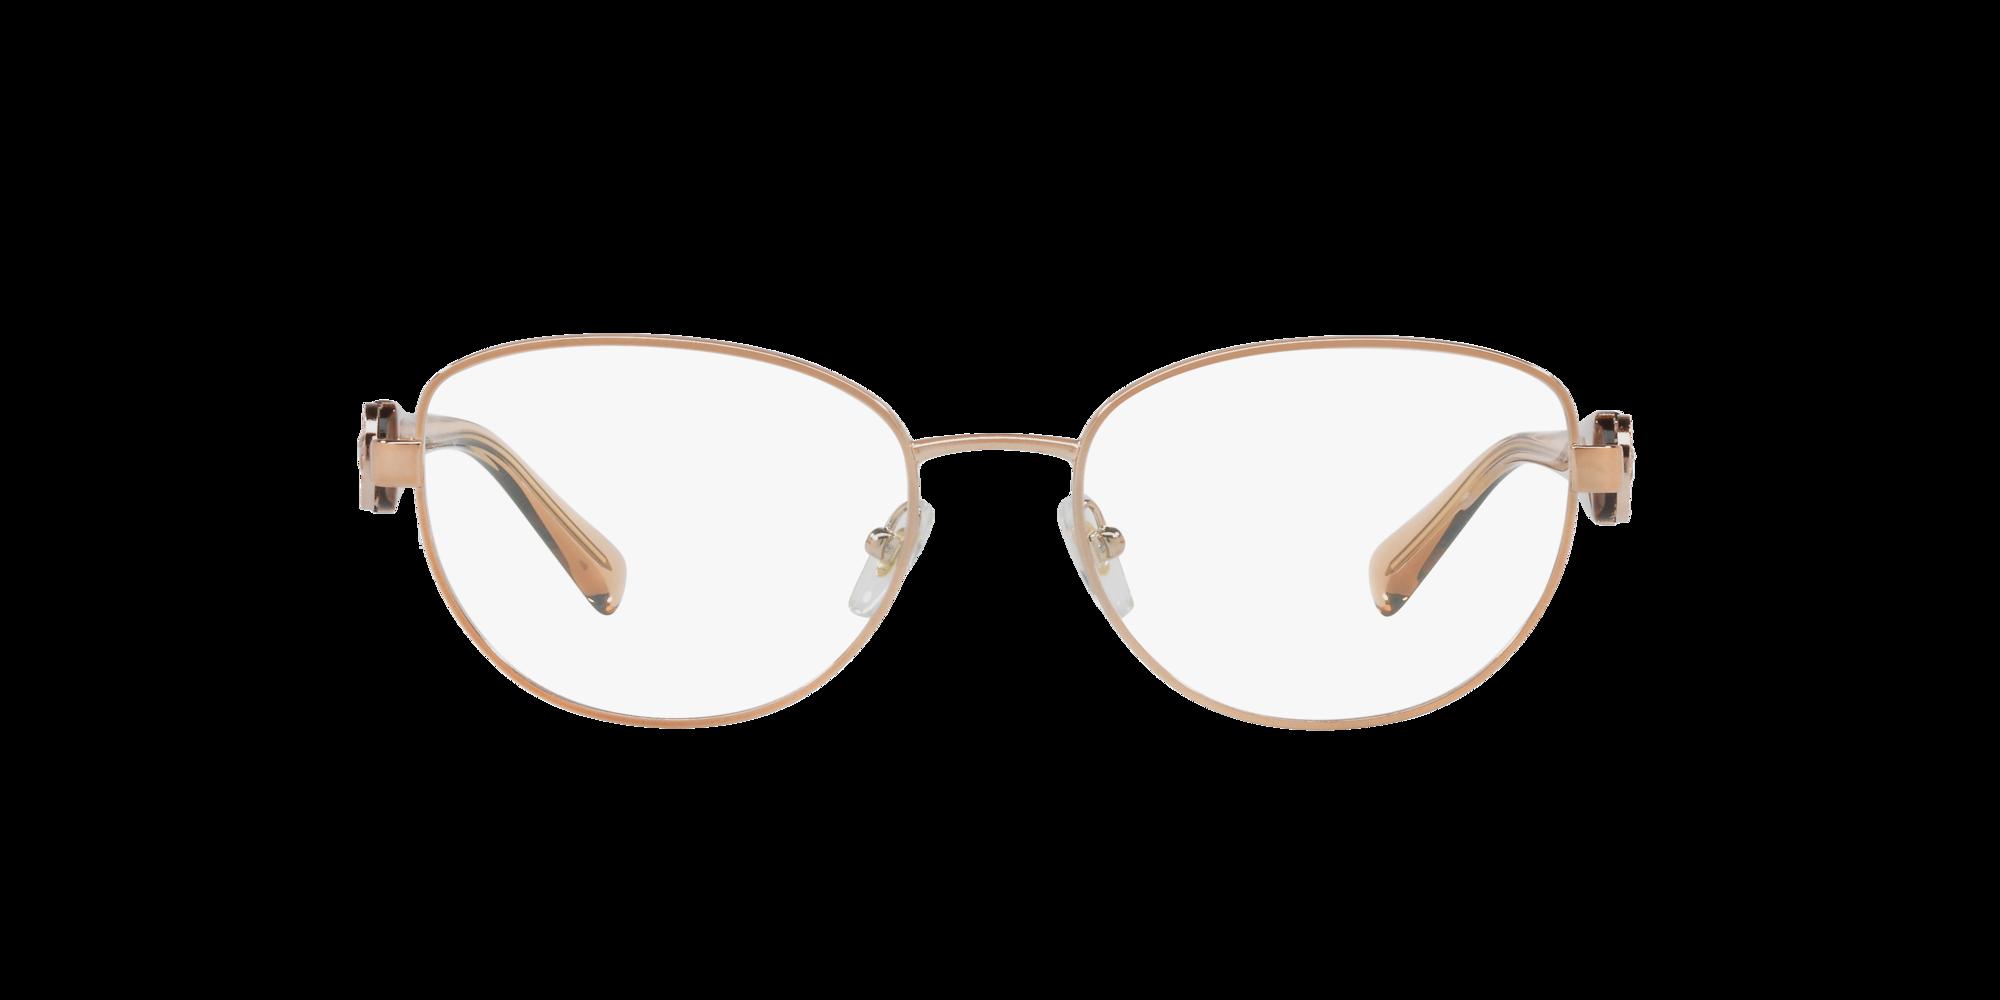 Image for VE1246B from LensCrafters | Glasses, Prescription Glasses Online, Eyewear